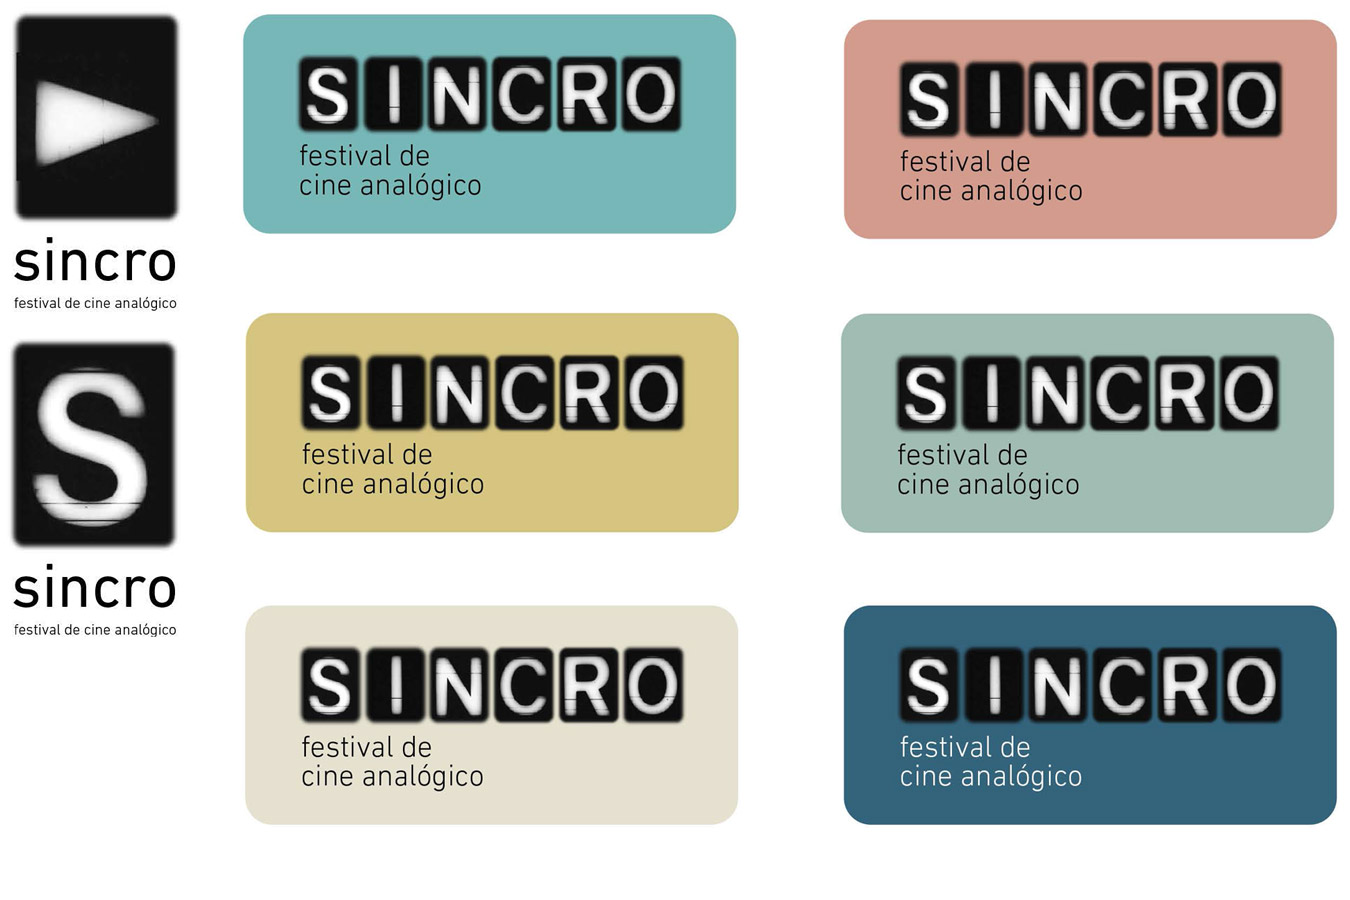 SINCRO (2017)